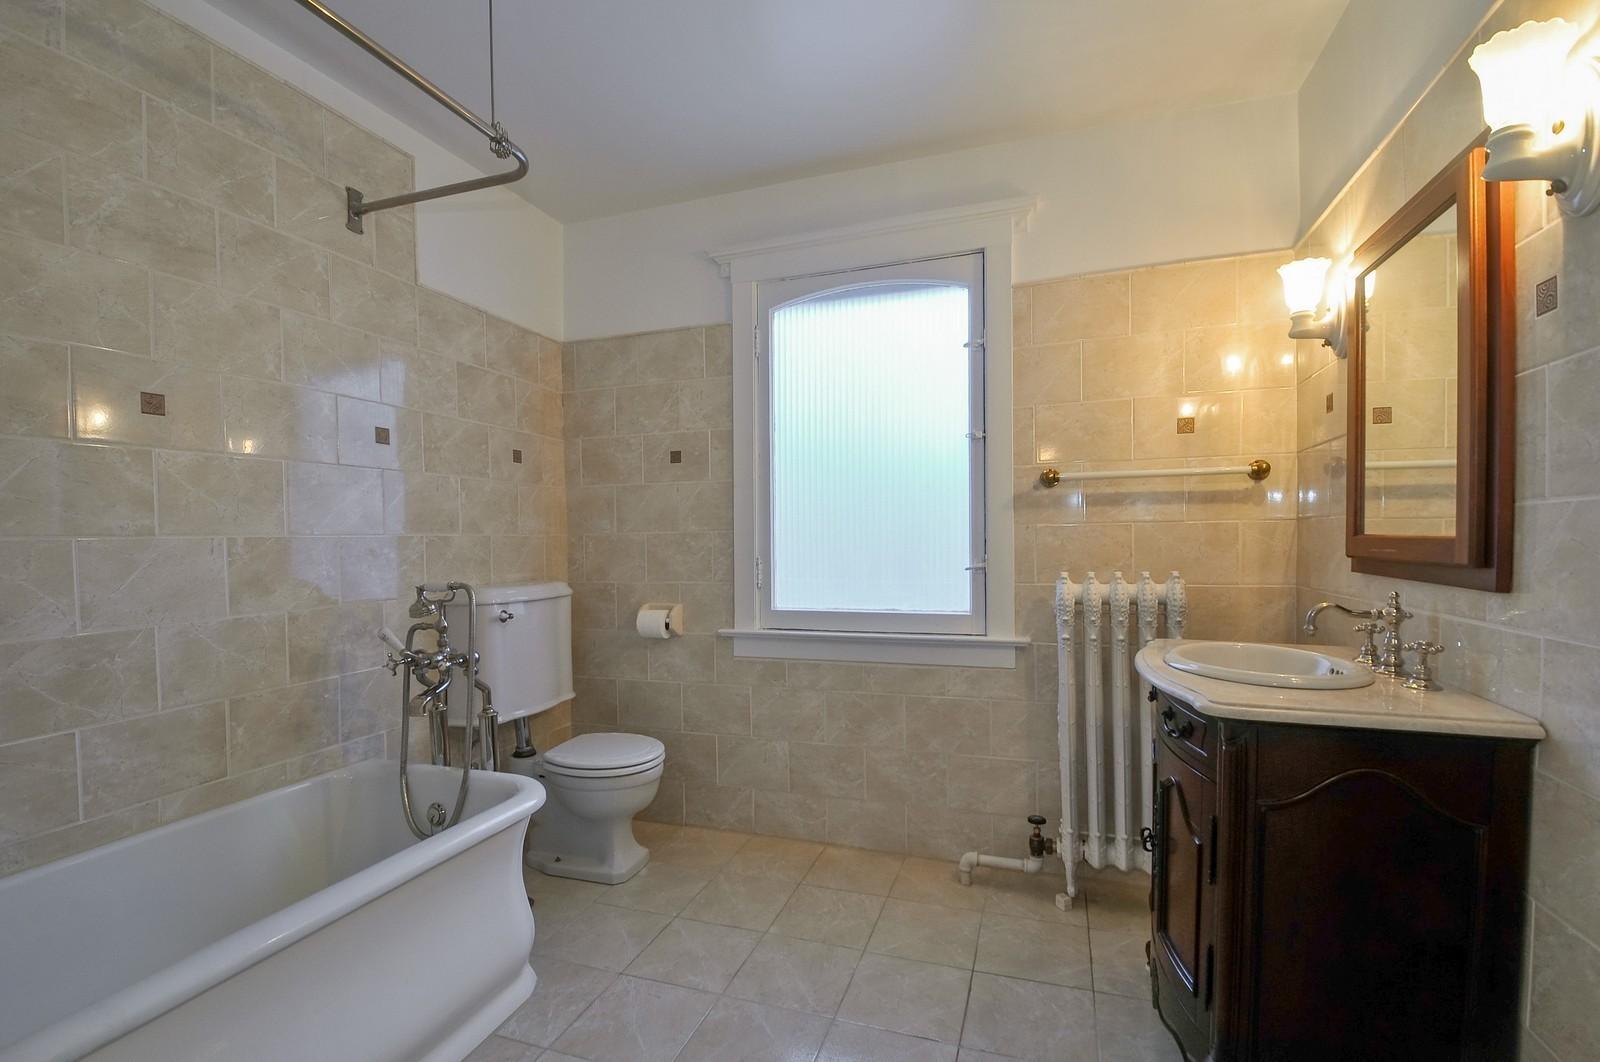 Real Estate Photography - 2226 W Pratt, Chicago, IL, 60645 - Bathroom